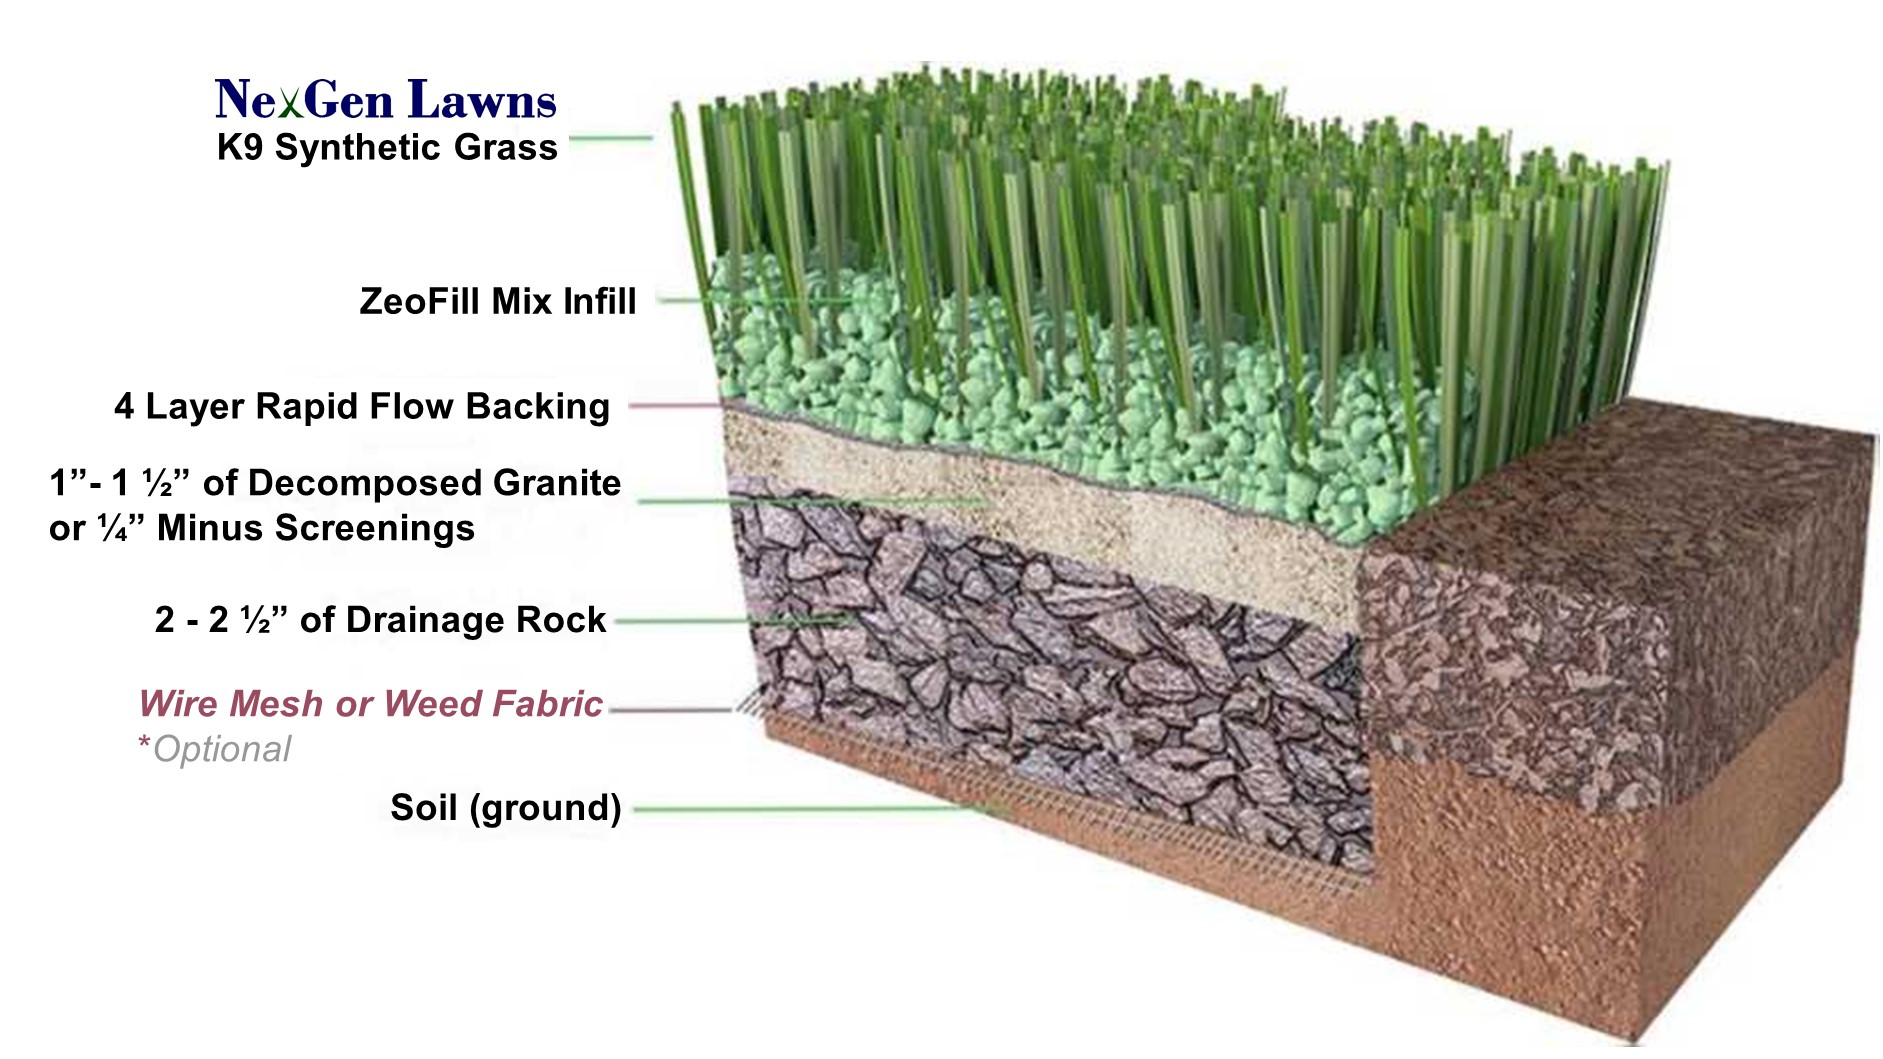 Amazoncom: artificial grass for dogs